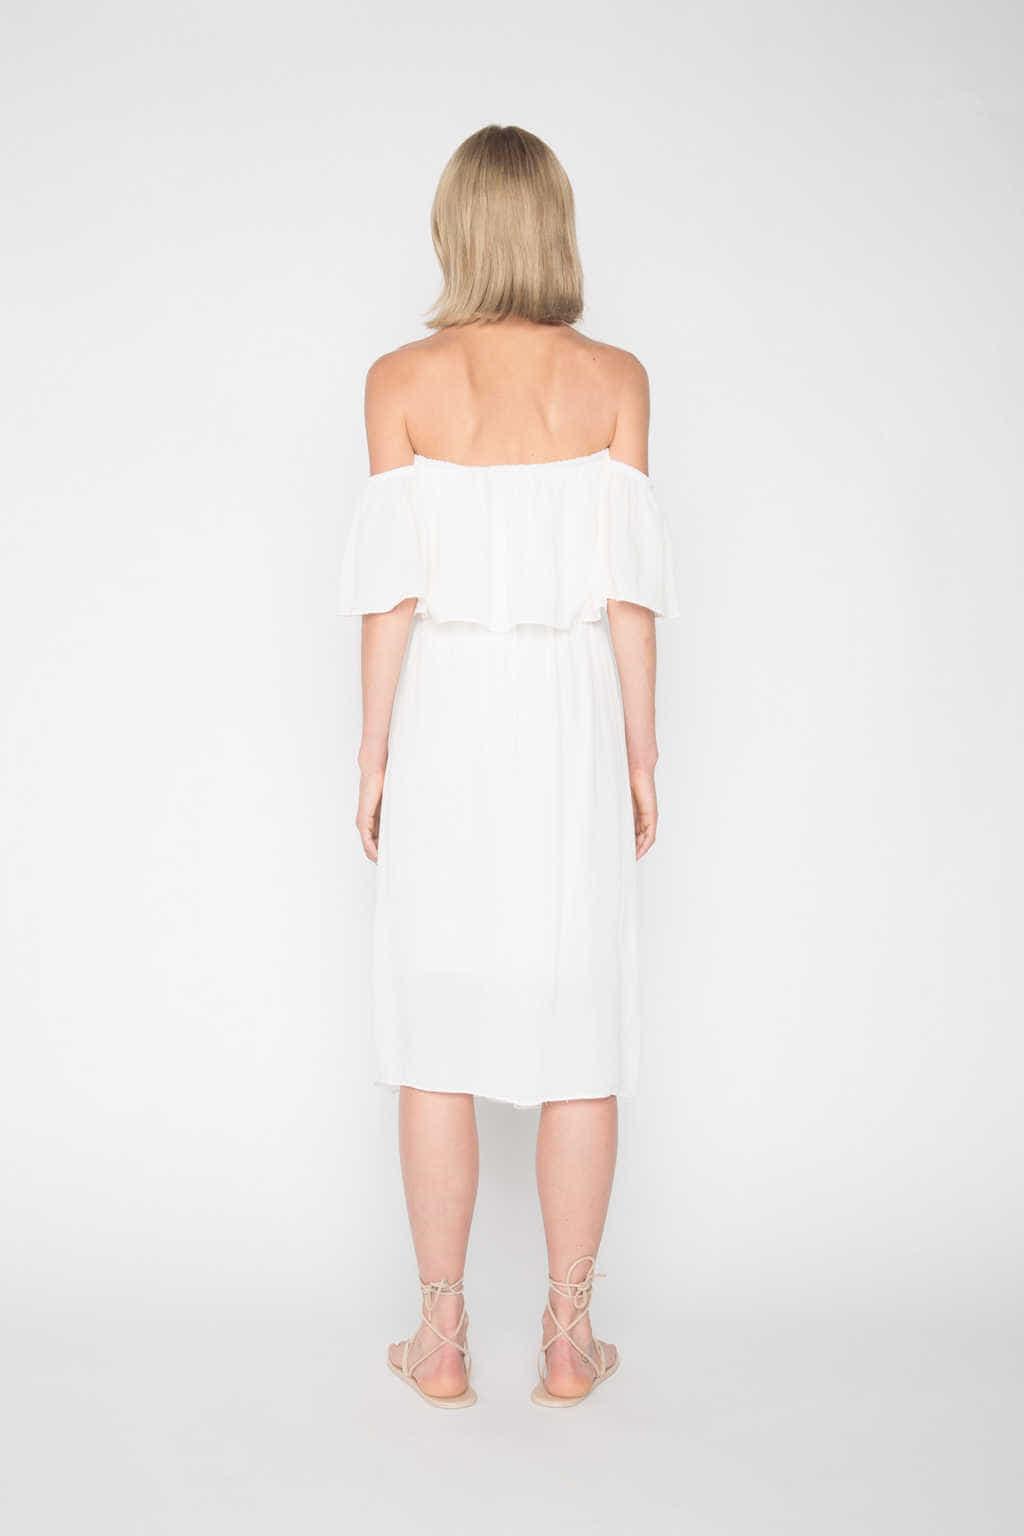 Dress H200 Cream 4